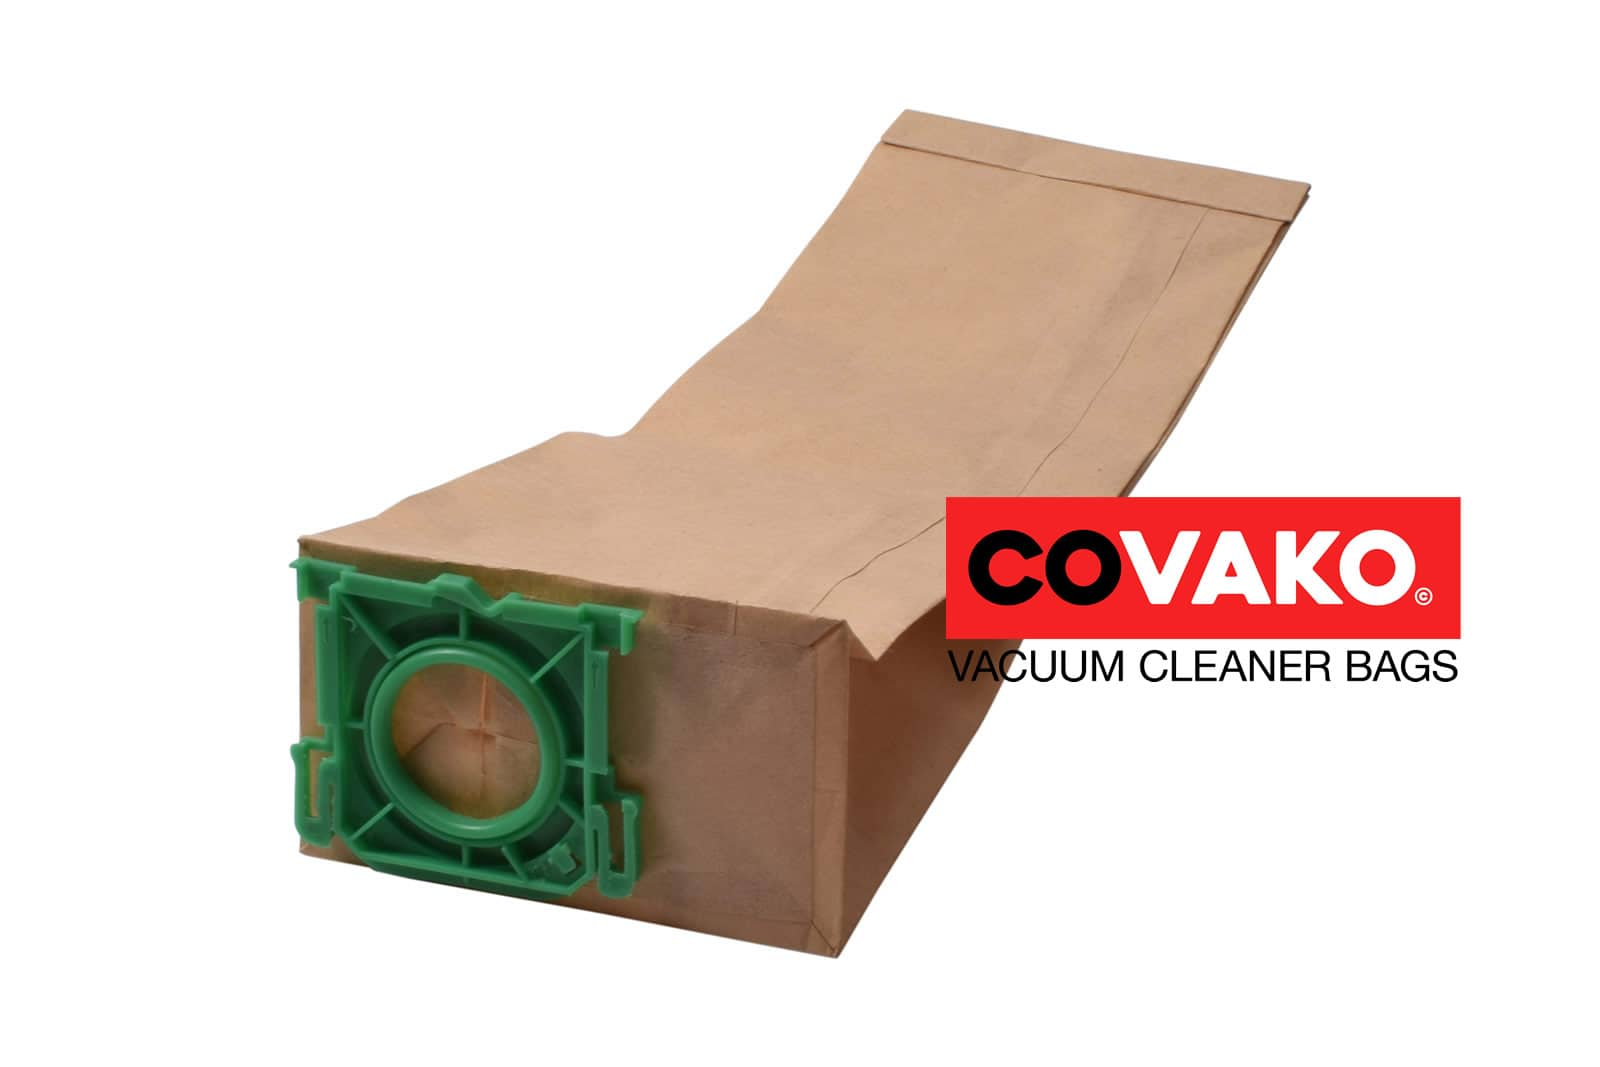 Columbus Profi 370 / Paper - Columbus vacuum cleaner bags